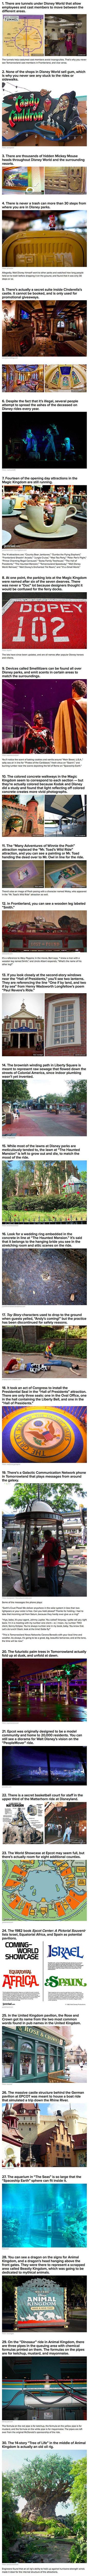 Disney has done it again